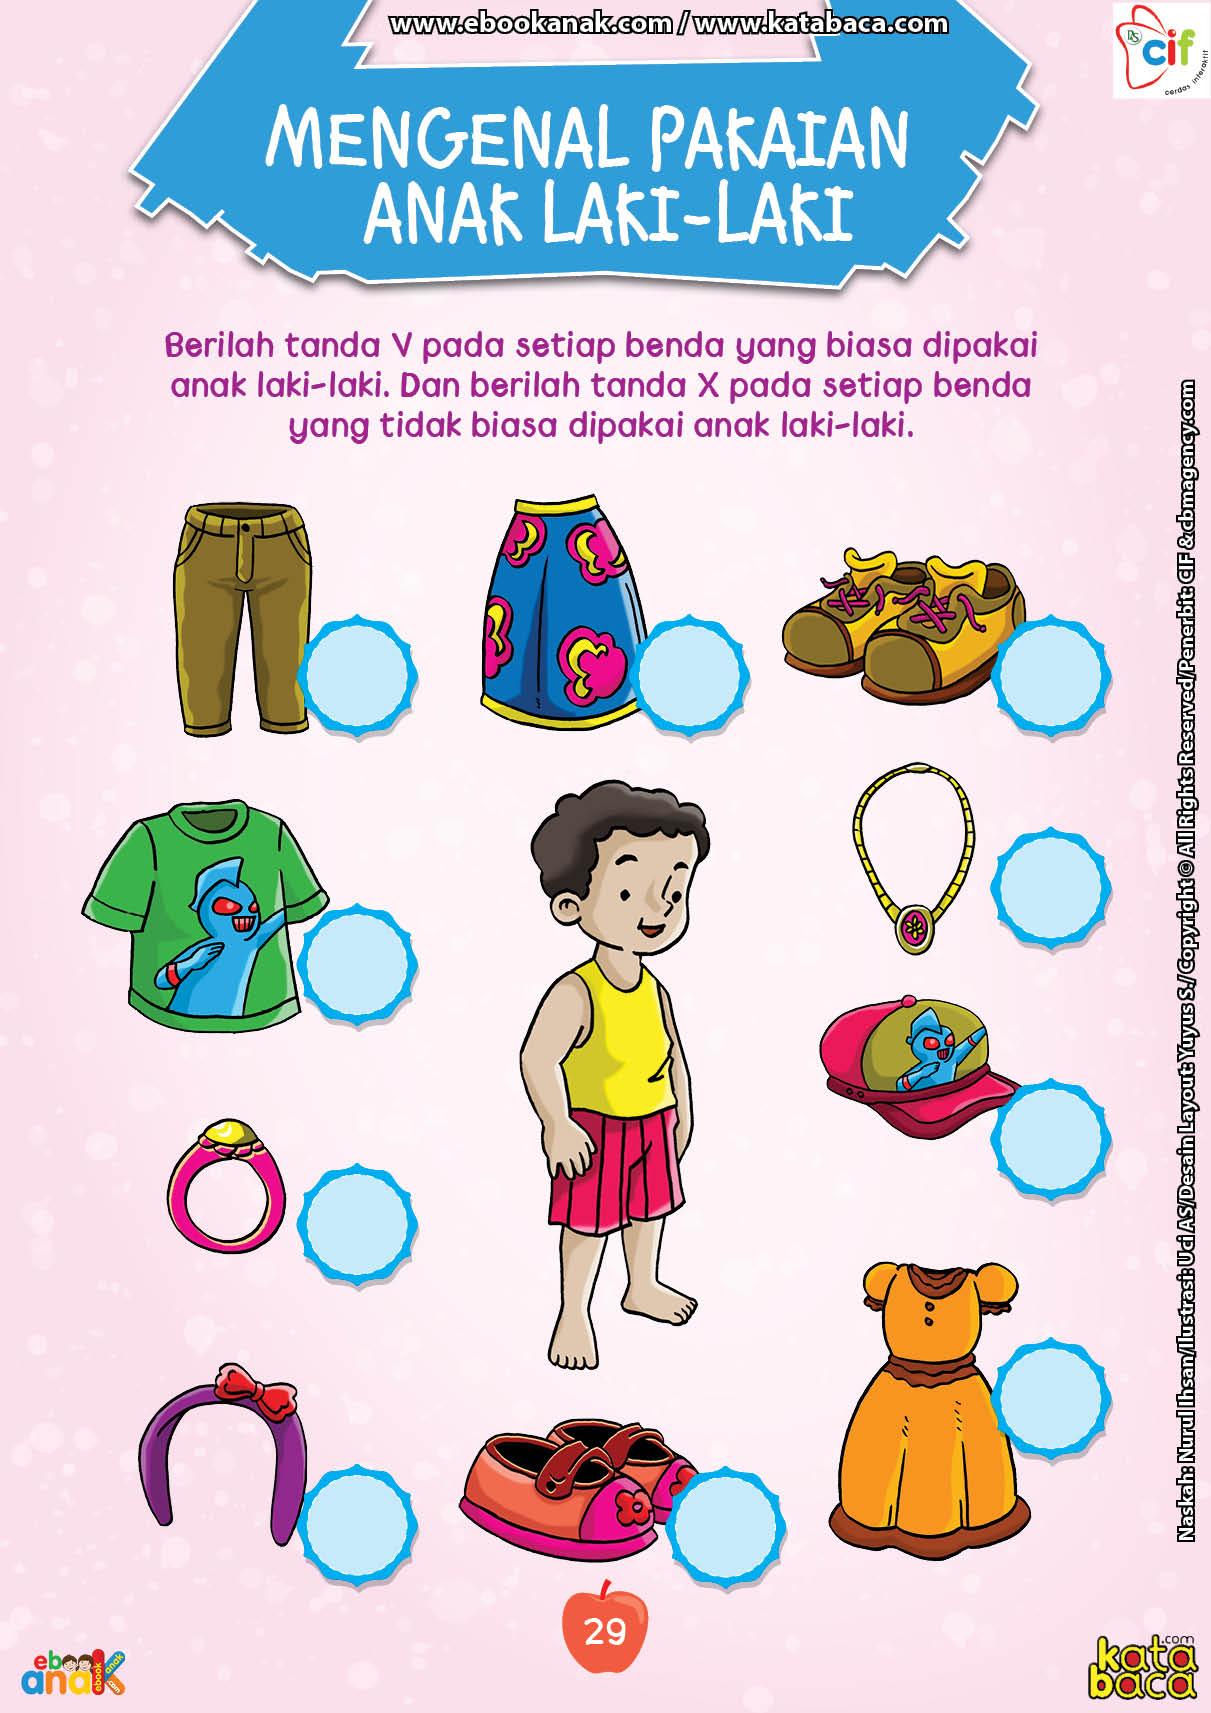 baca buku online brain games fun sains37 Mengenal Pakaian Anak Laki-Laki